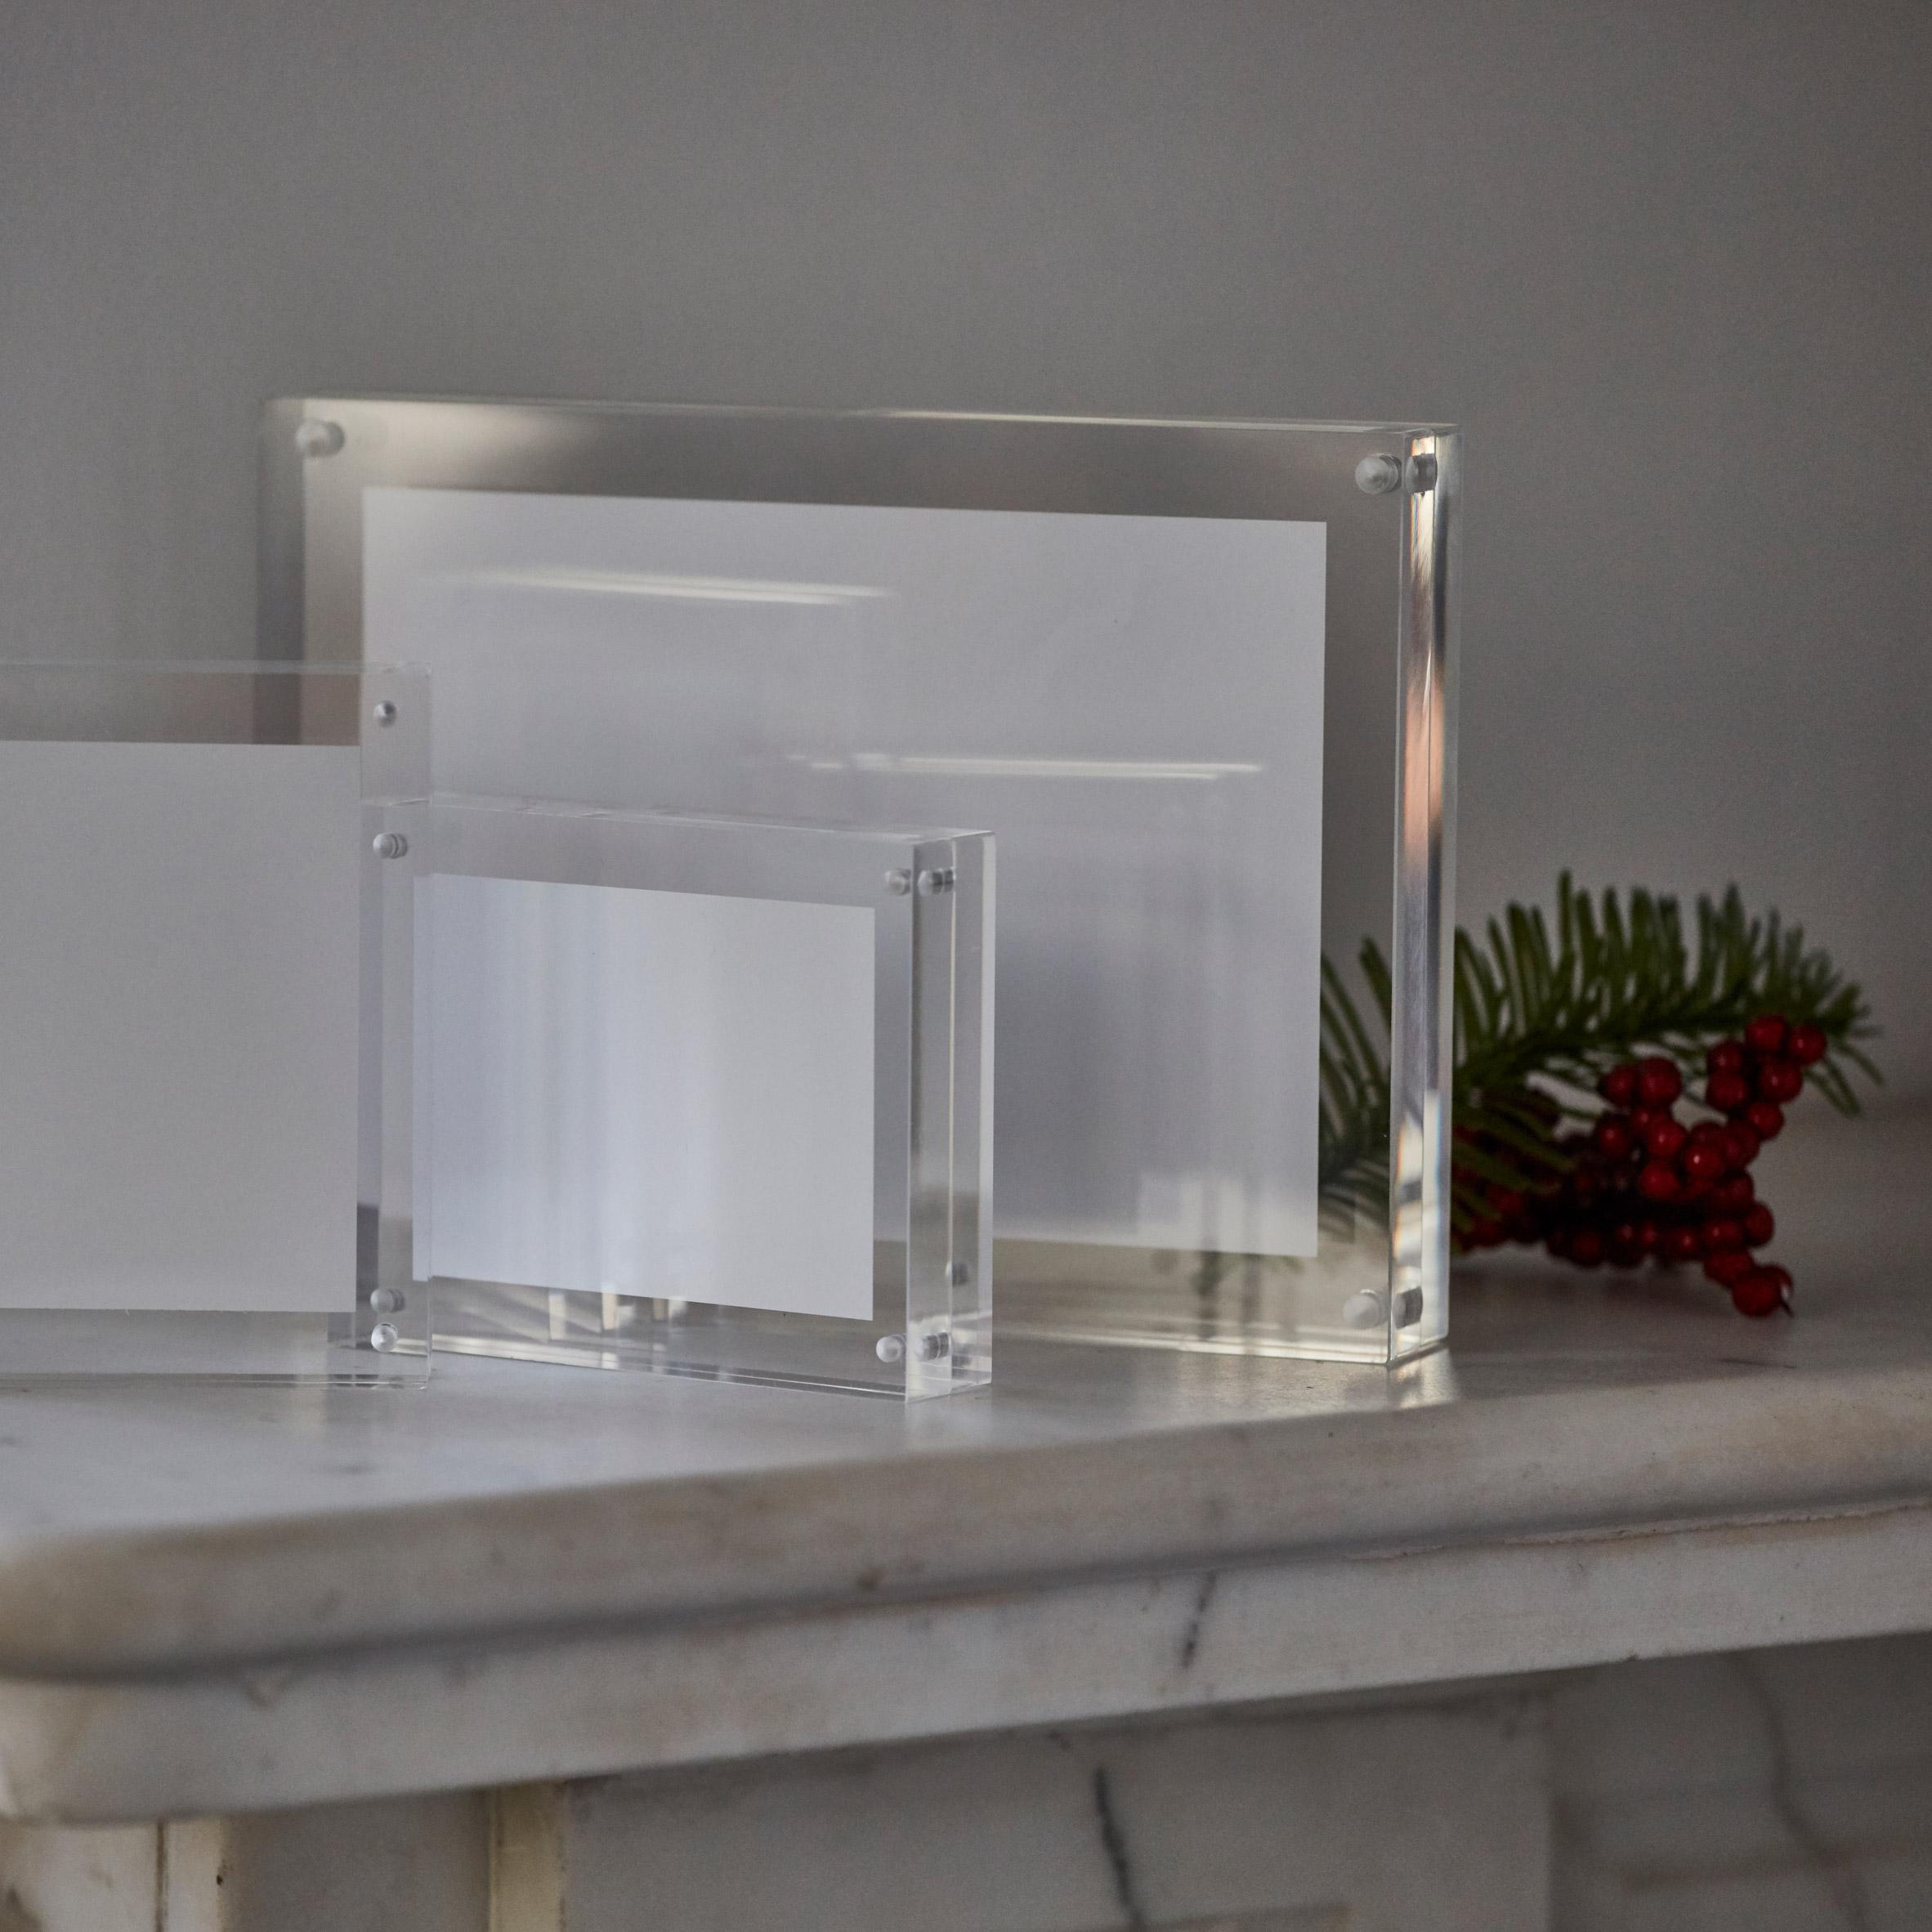 Muji Magnetic Photo Frames